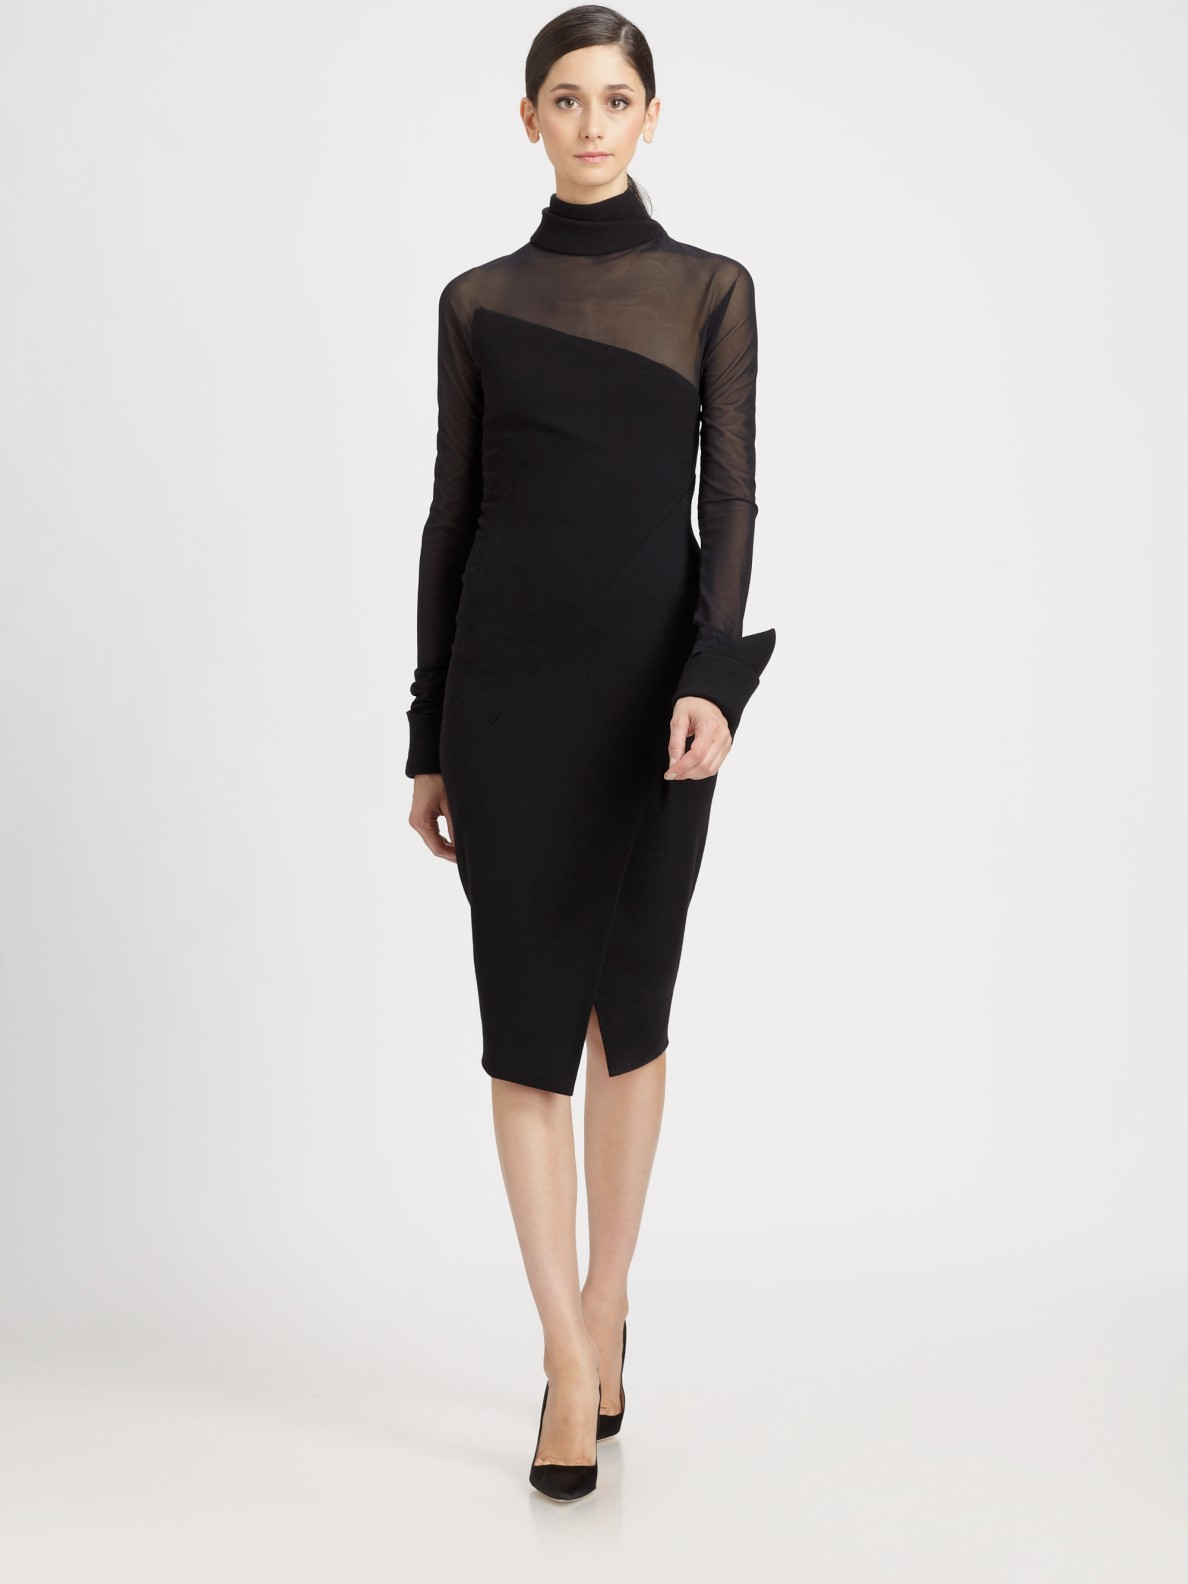 Donna Karan Black Dresses